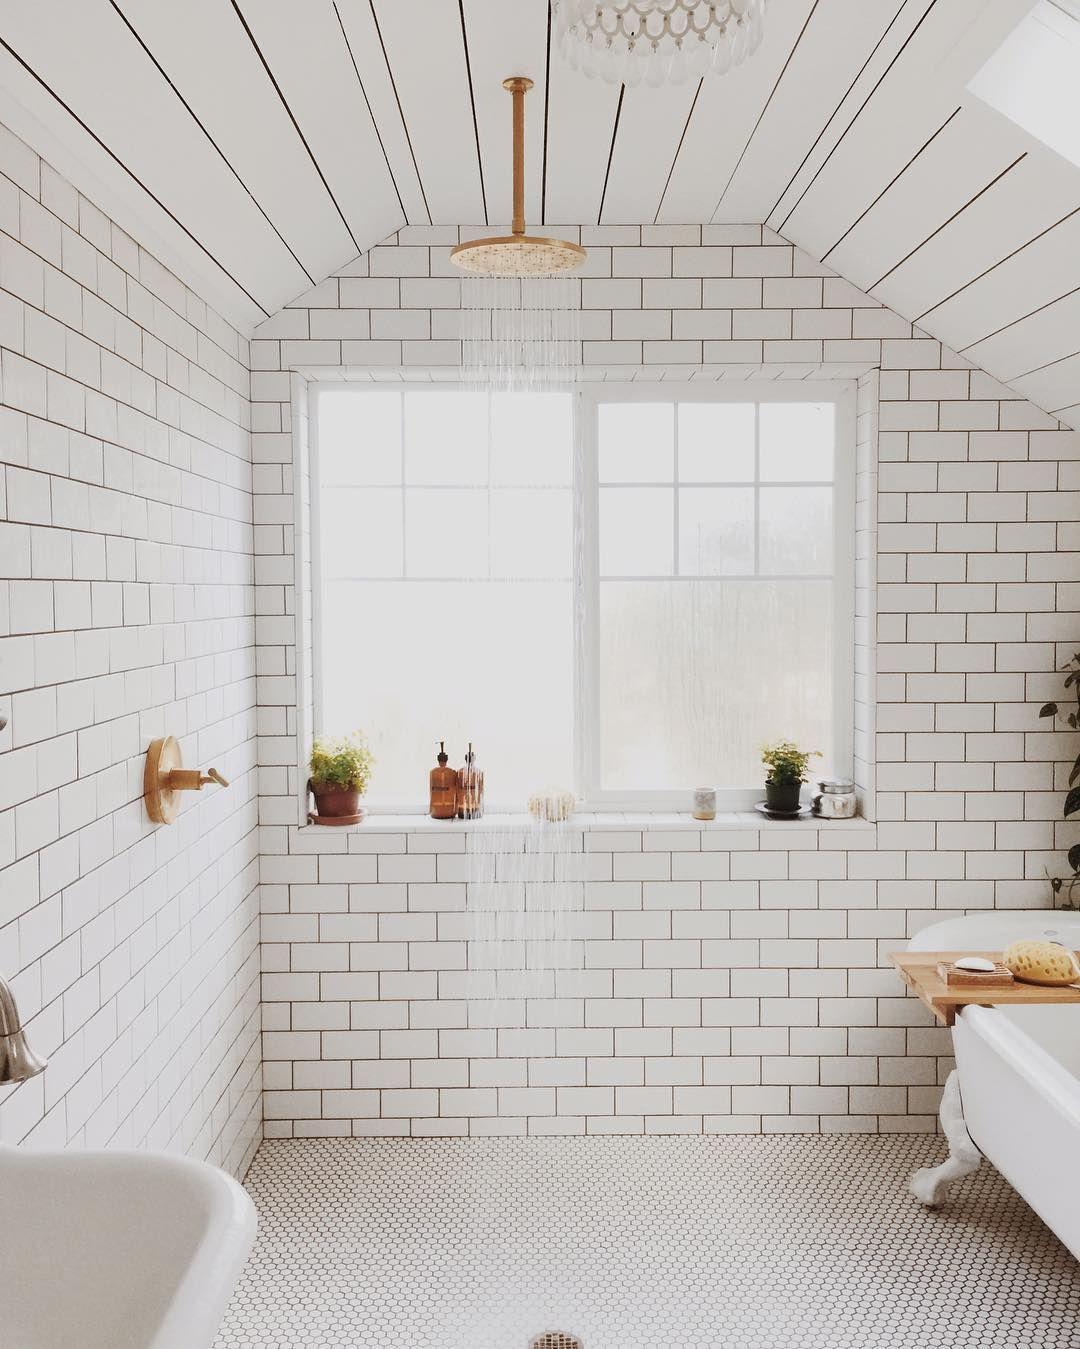 Bathroom Design Trends - Bathroom Trends in 2017 | jaj | Pinterest ...